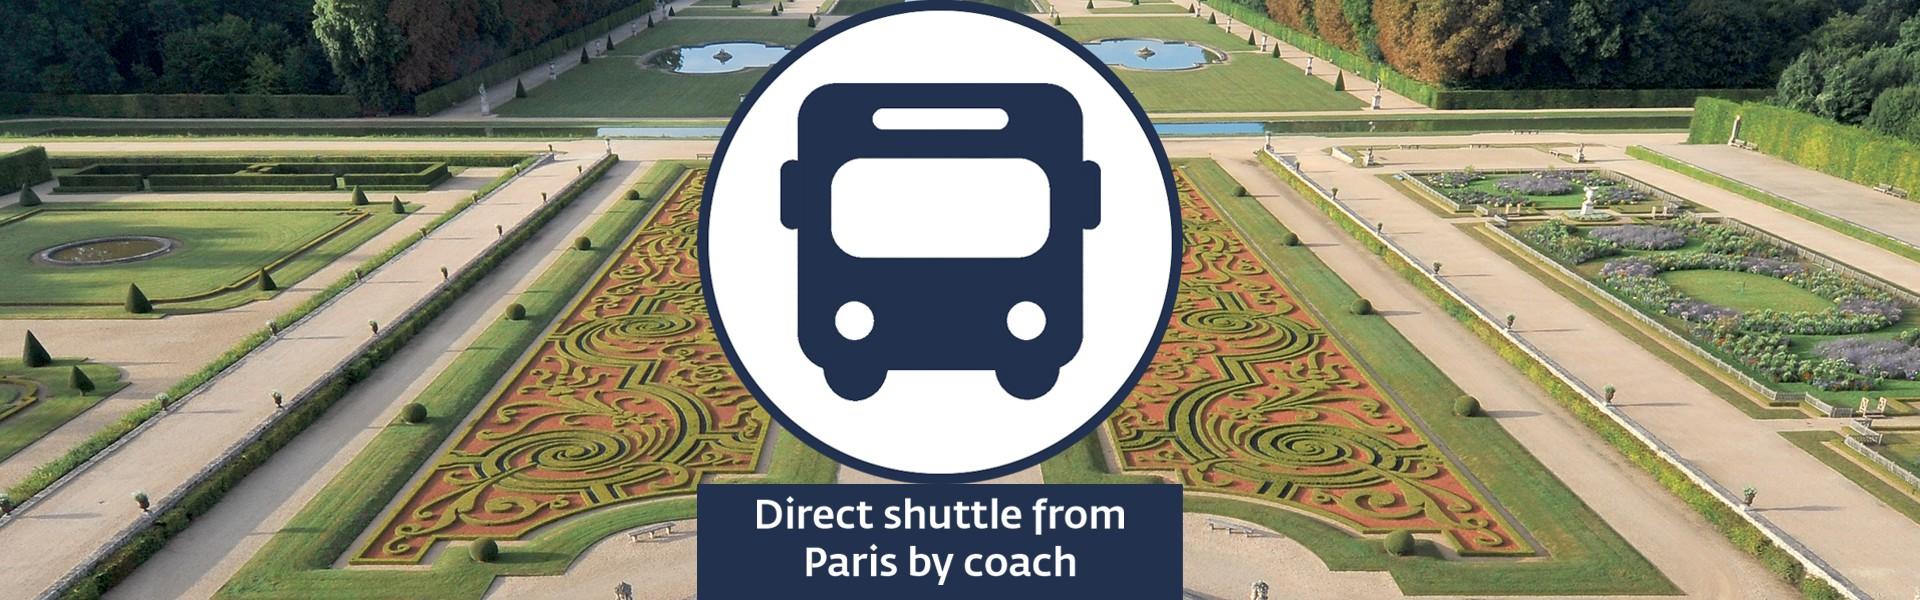 shuttle transport from Paris